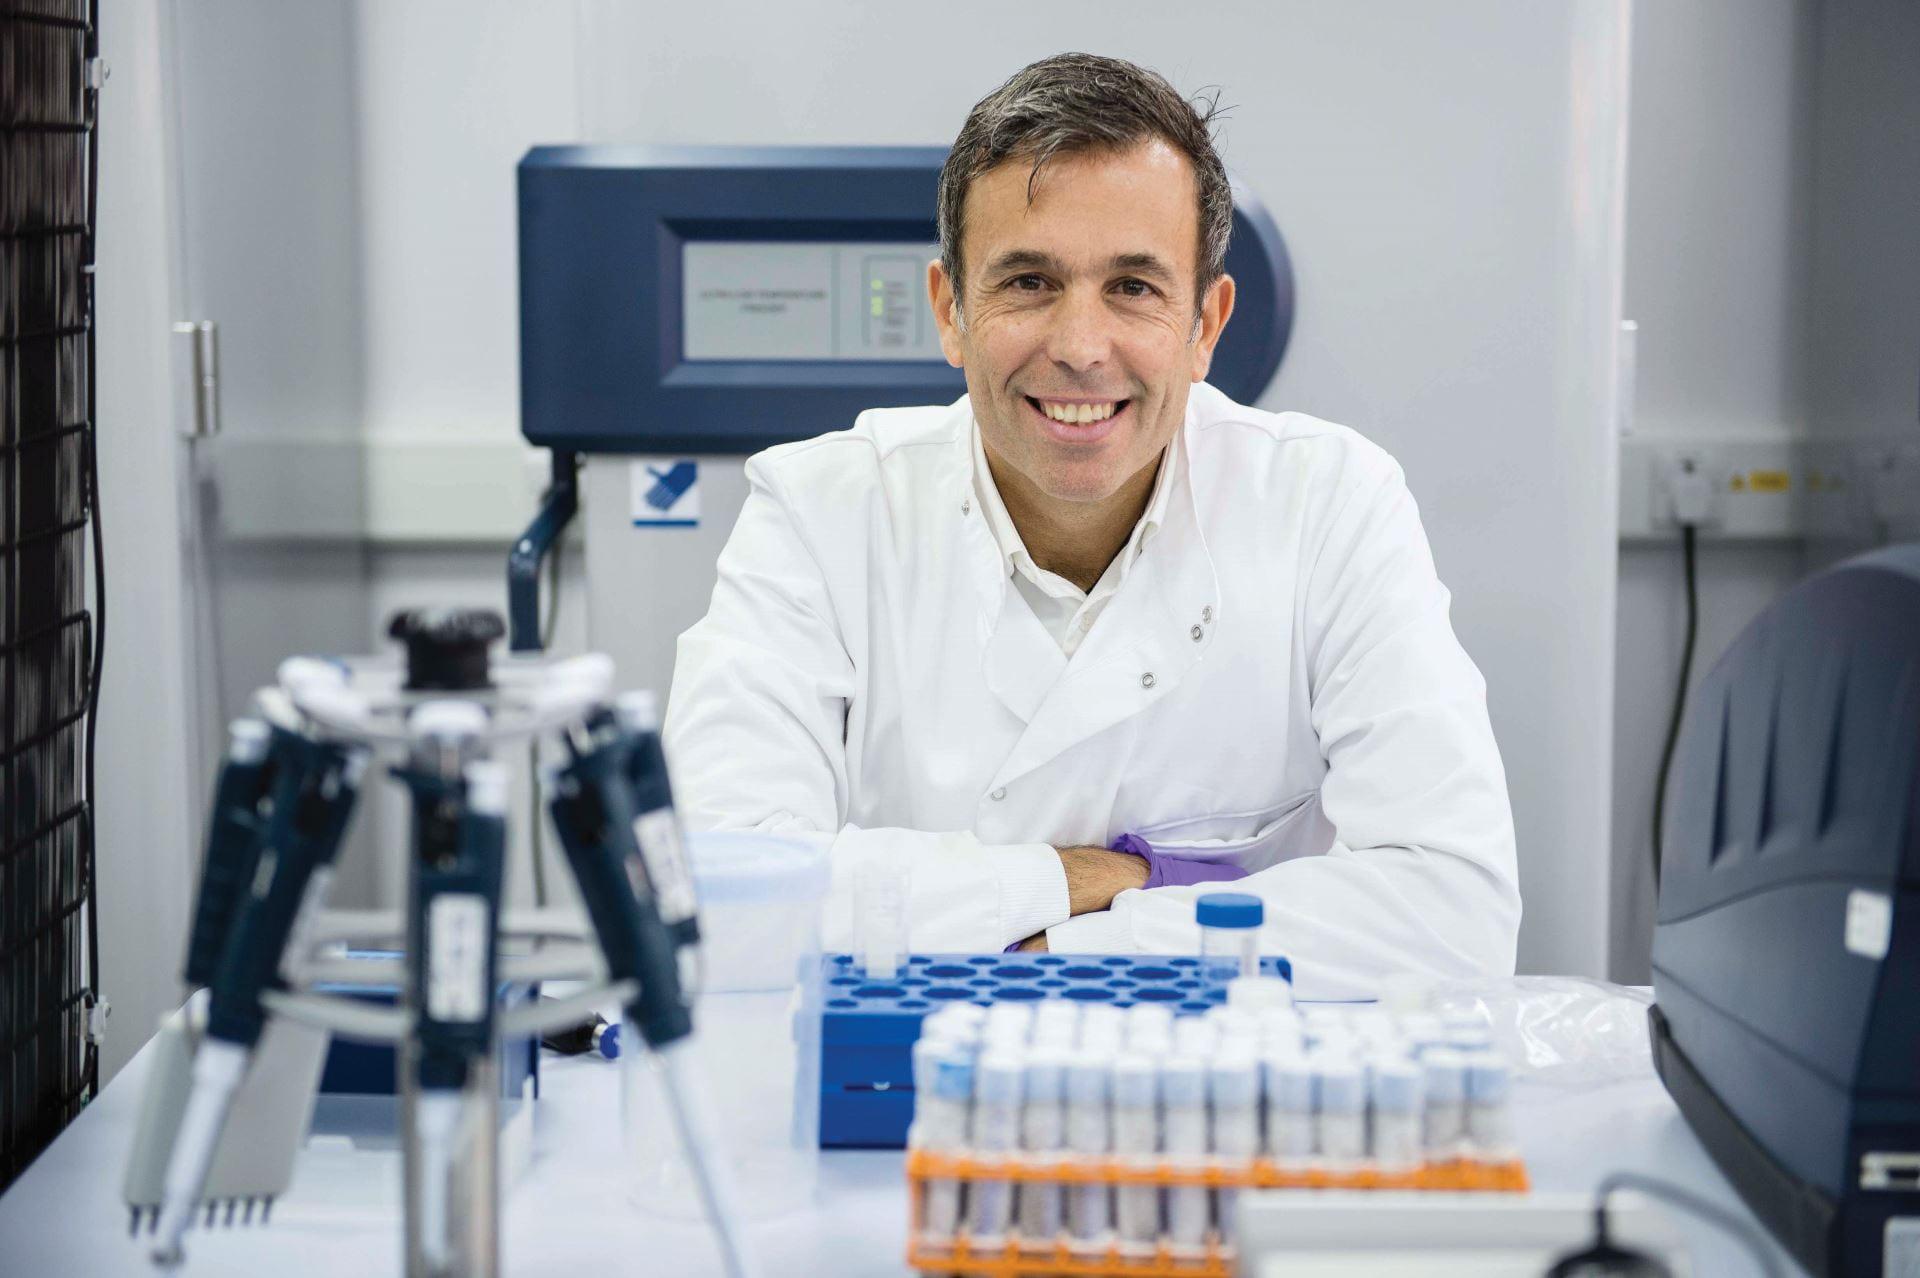 Profesor Yannis Pitsiladis in the labs